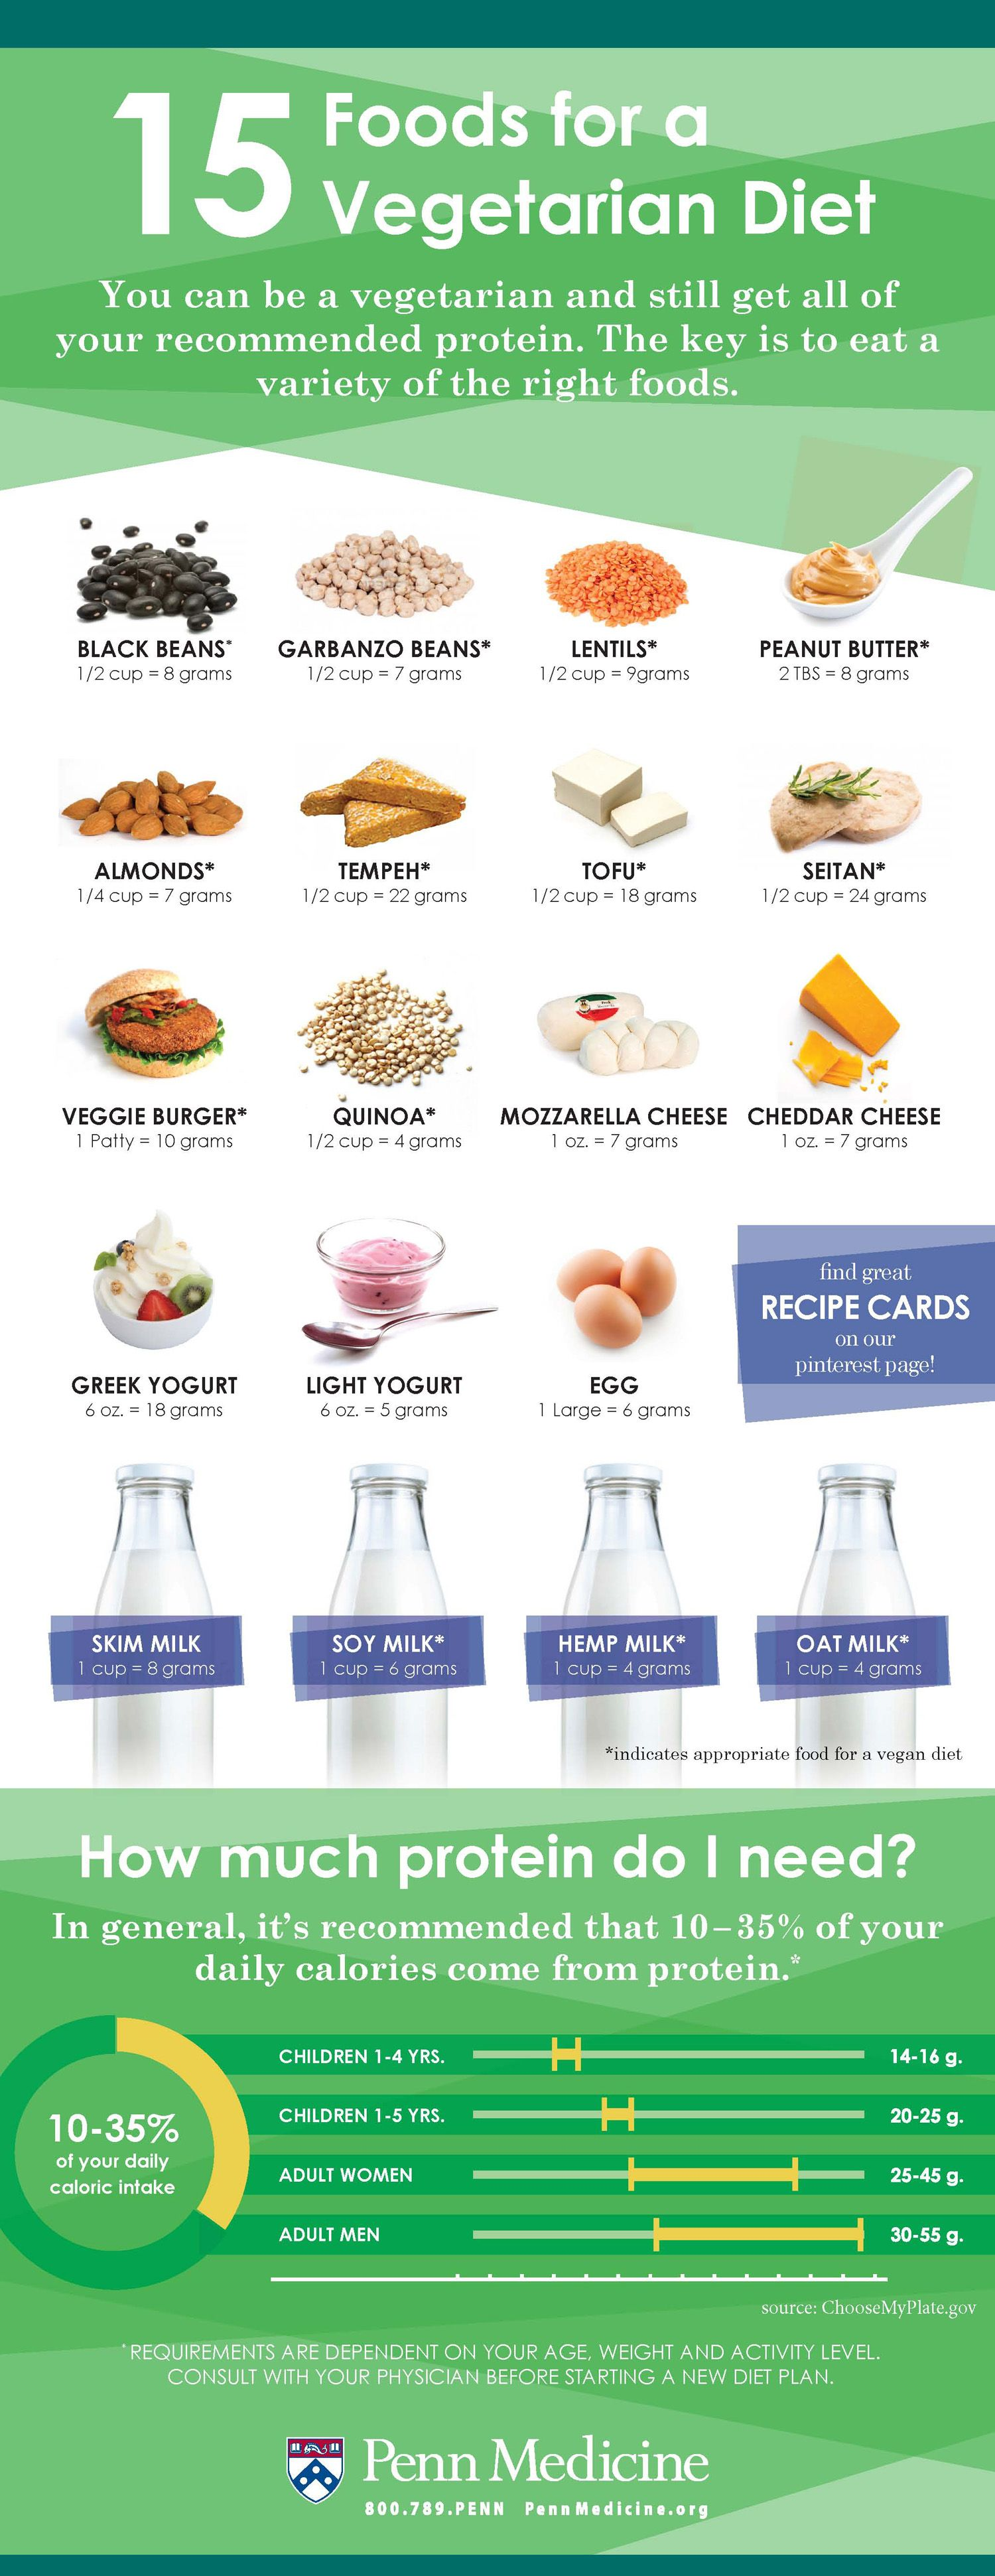 Diabetes and a Vegetarian Diet